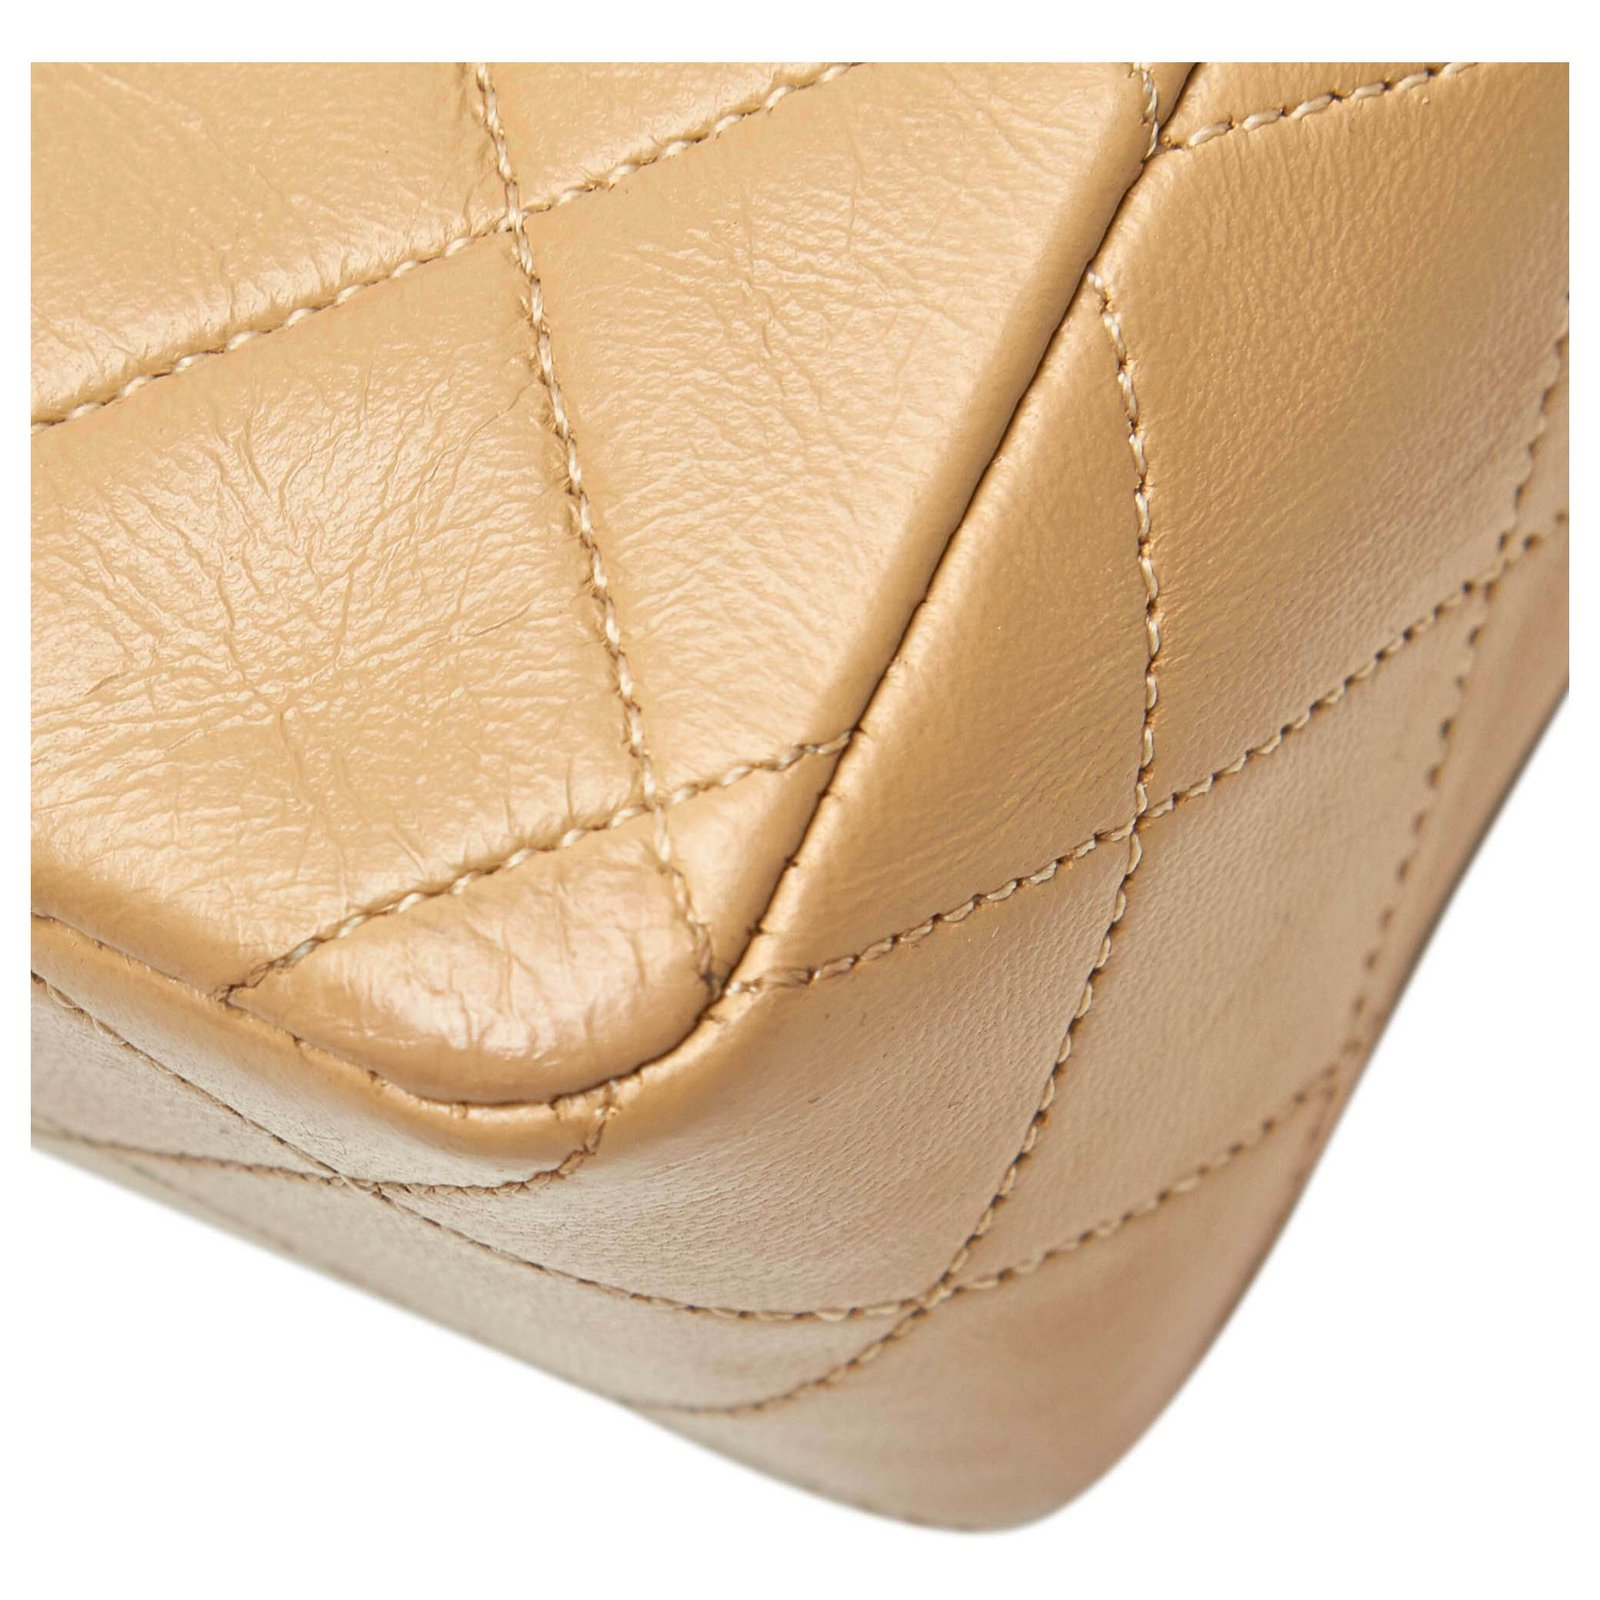 9d2bbe7665a87e Chanel Chanel Brown Classic Mini Square Lambskin Leather Single Flap Bag  Handbags Leather Brown,Beige ref.120545 - Joli Closet